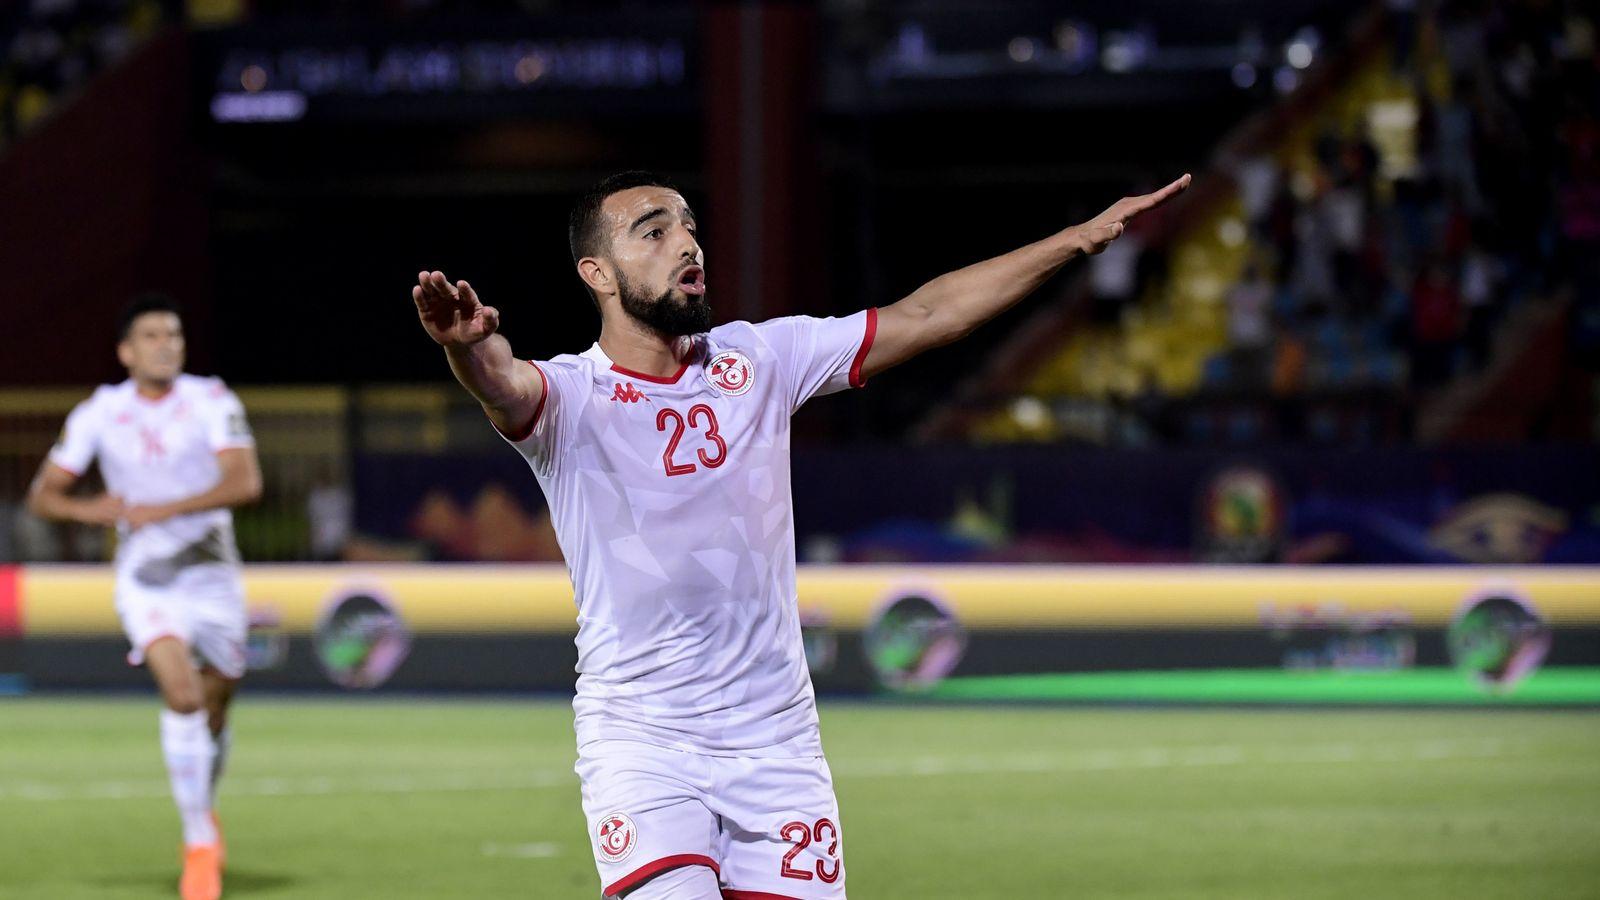 Madagascar 0 - 3 Tunisia - Match Report & Highlights